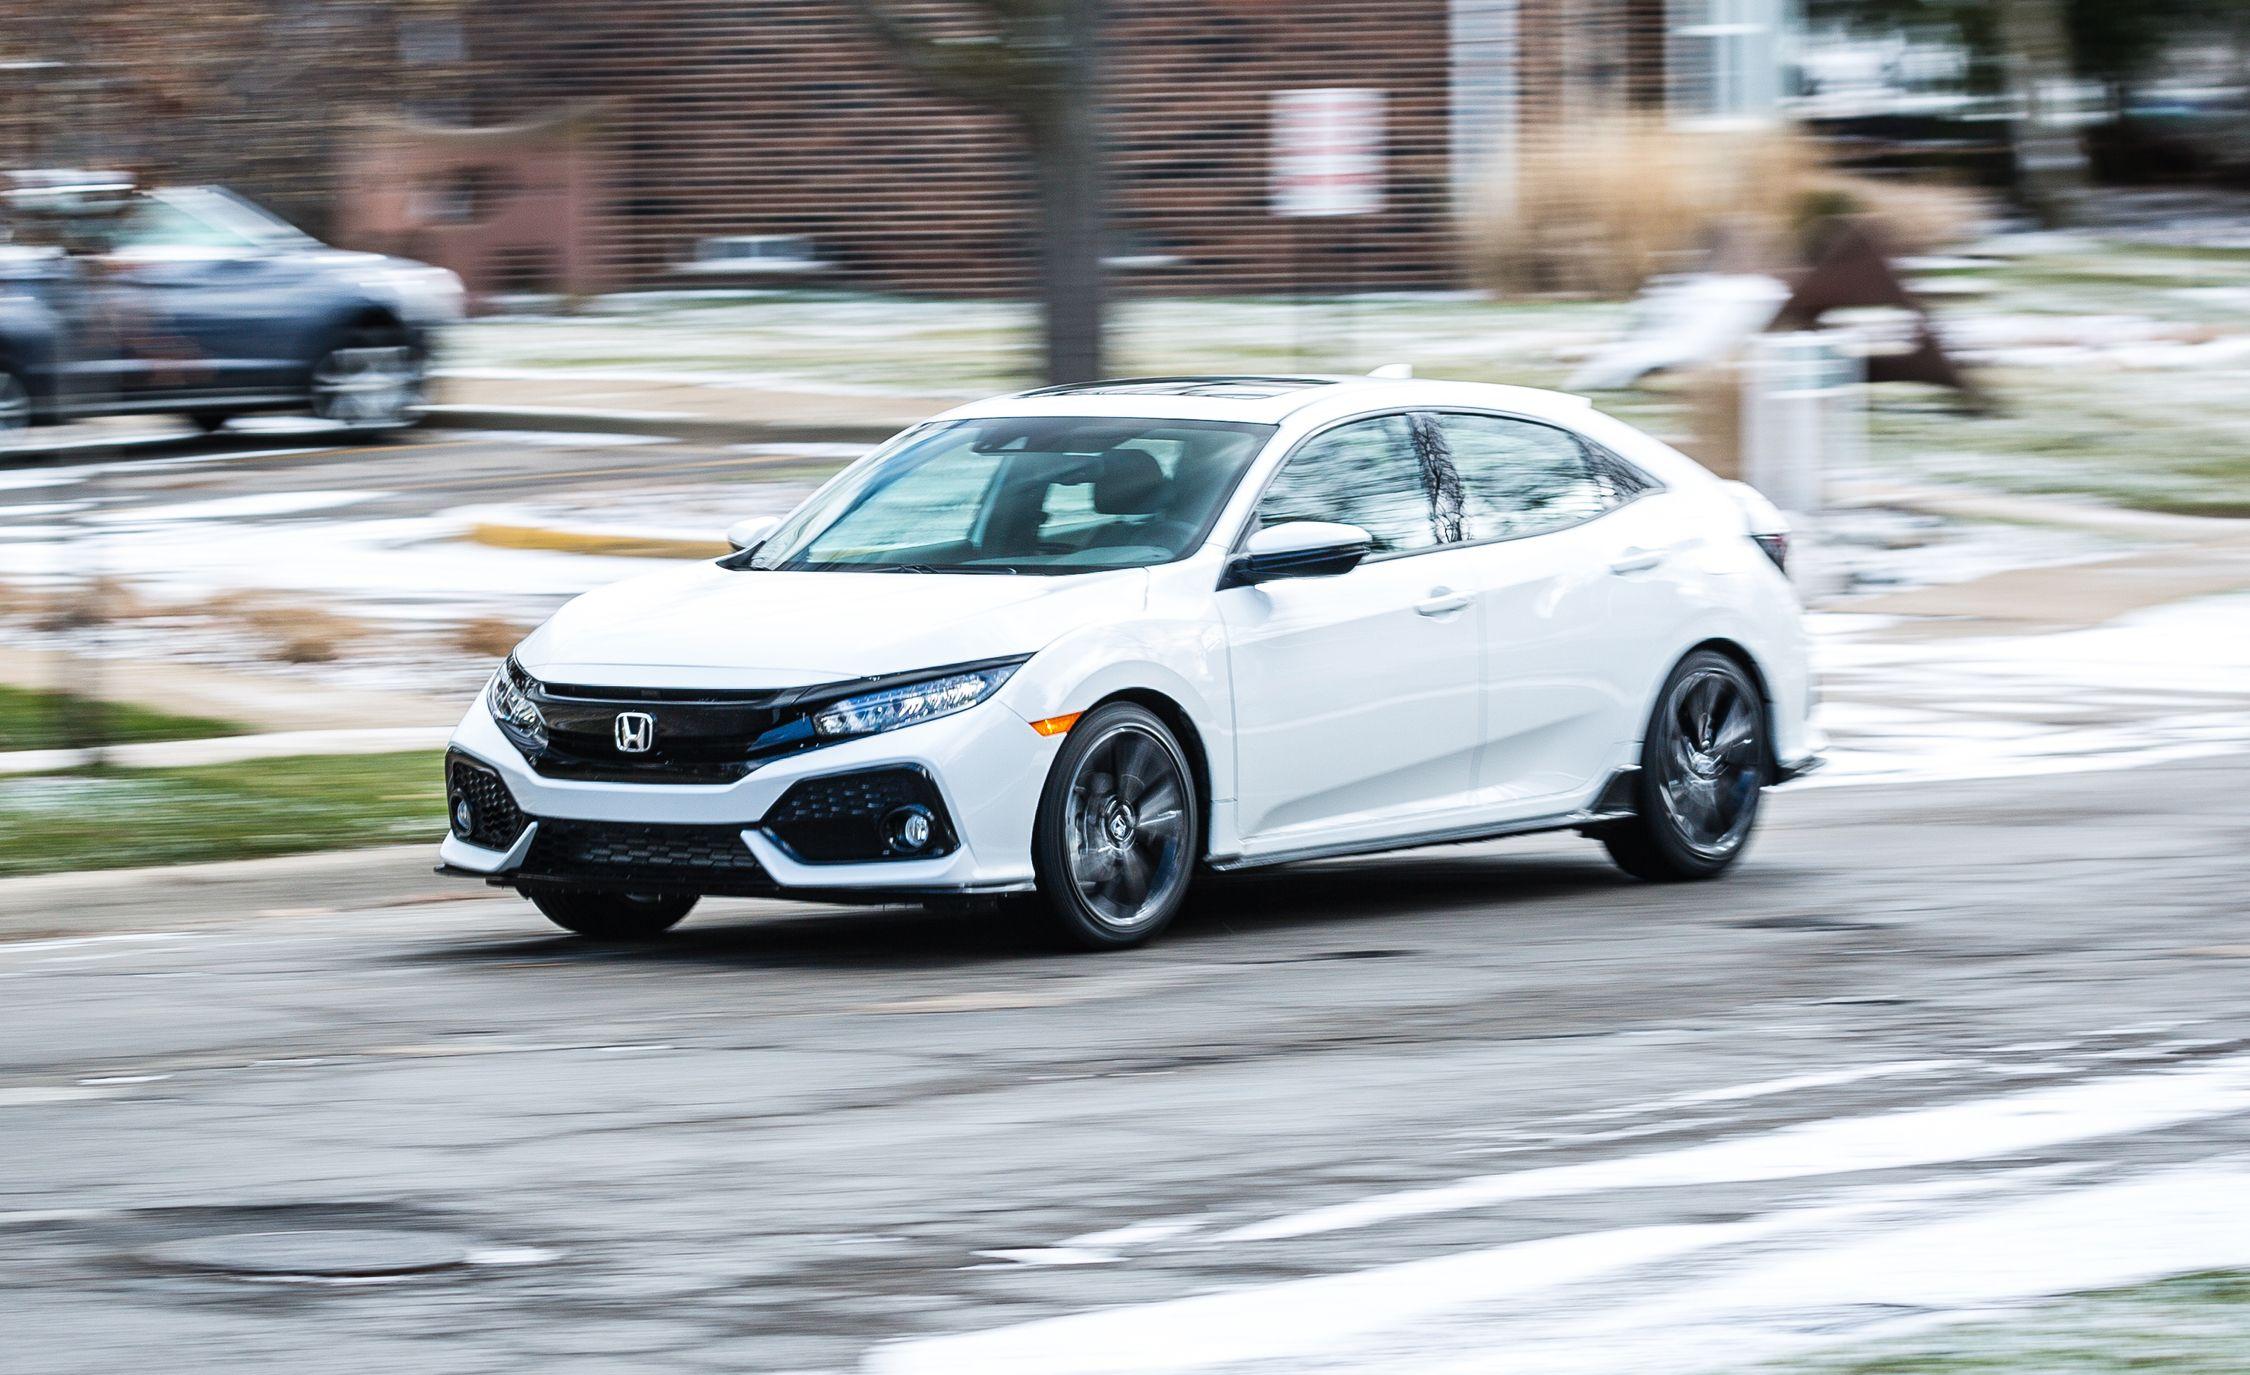 2017 honda civic hatchback cvt automatic review car and driver rh caranddriver com 2013 Honda Civic LX 4Dr 2013 Honda Civic LX 4Dr